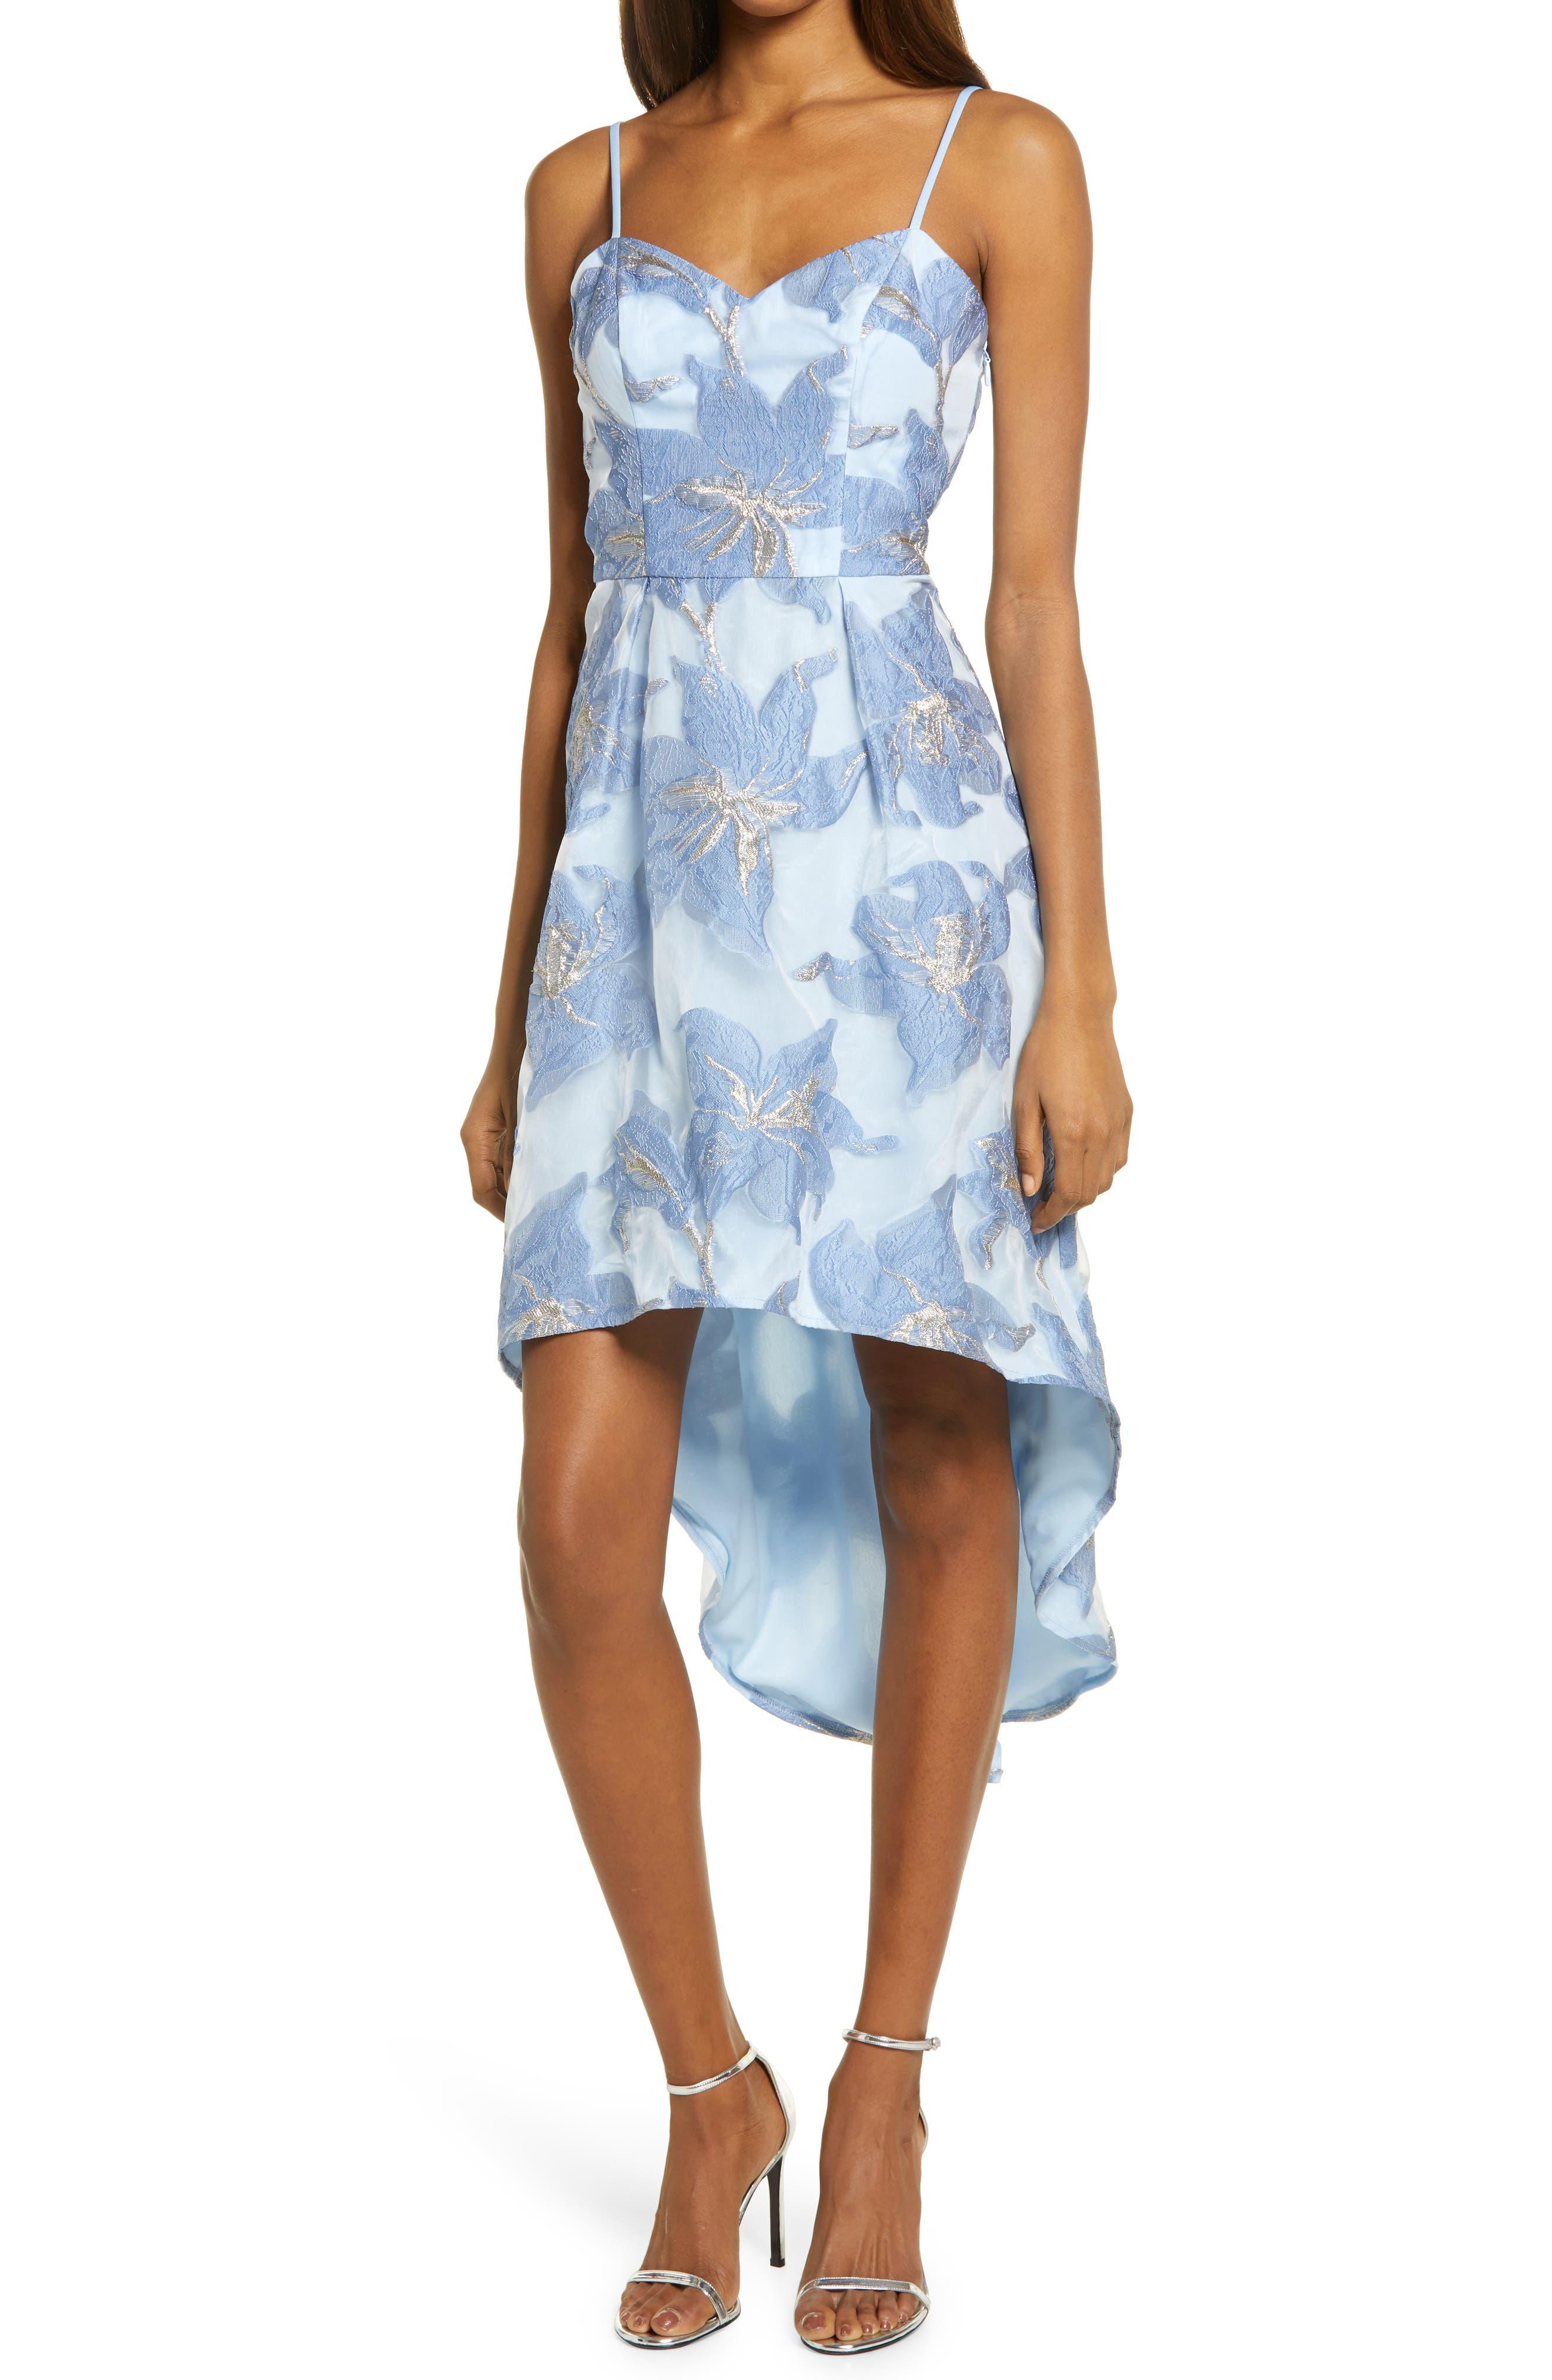 Metallic Floral Jacquard High/low Cocktail Dress